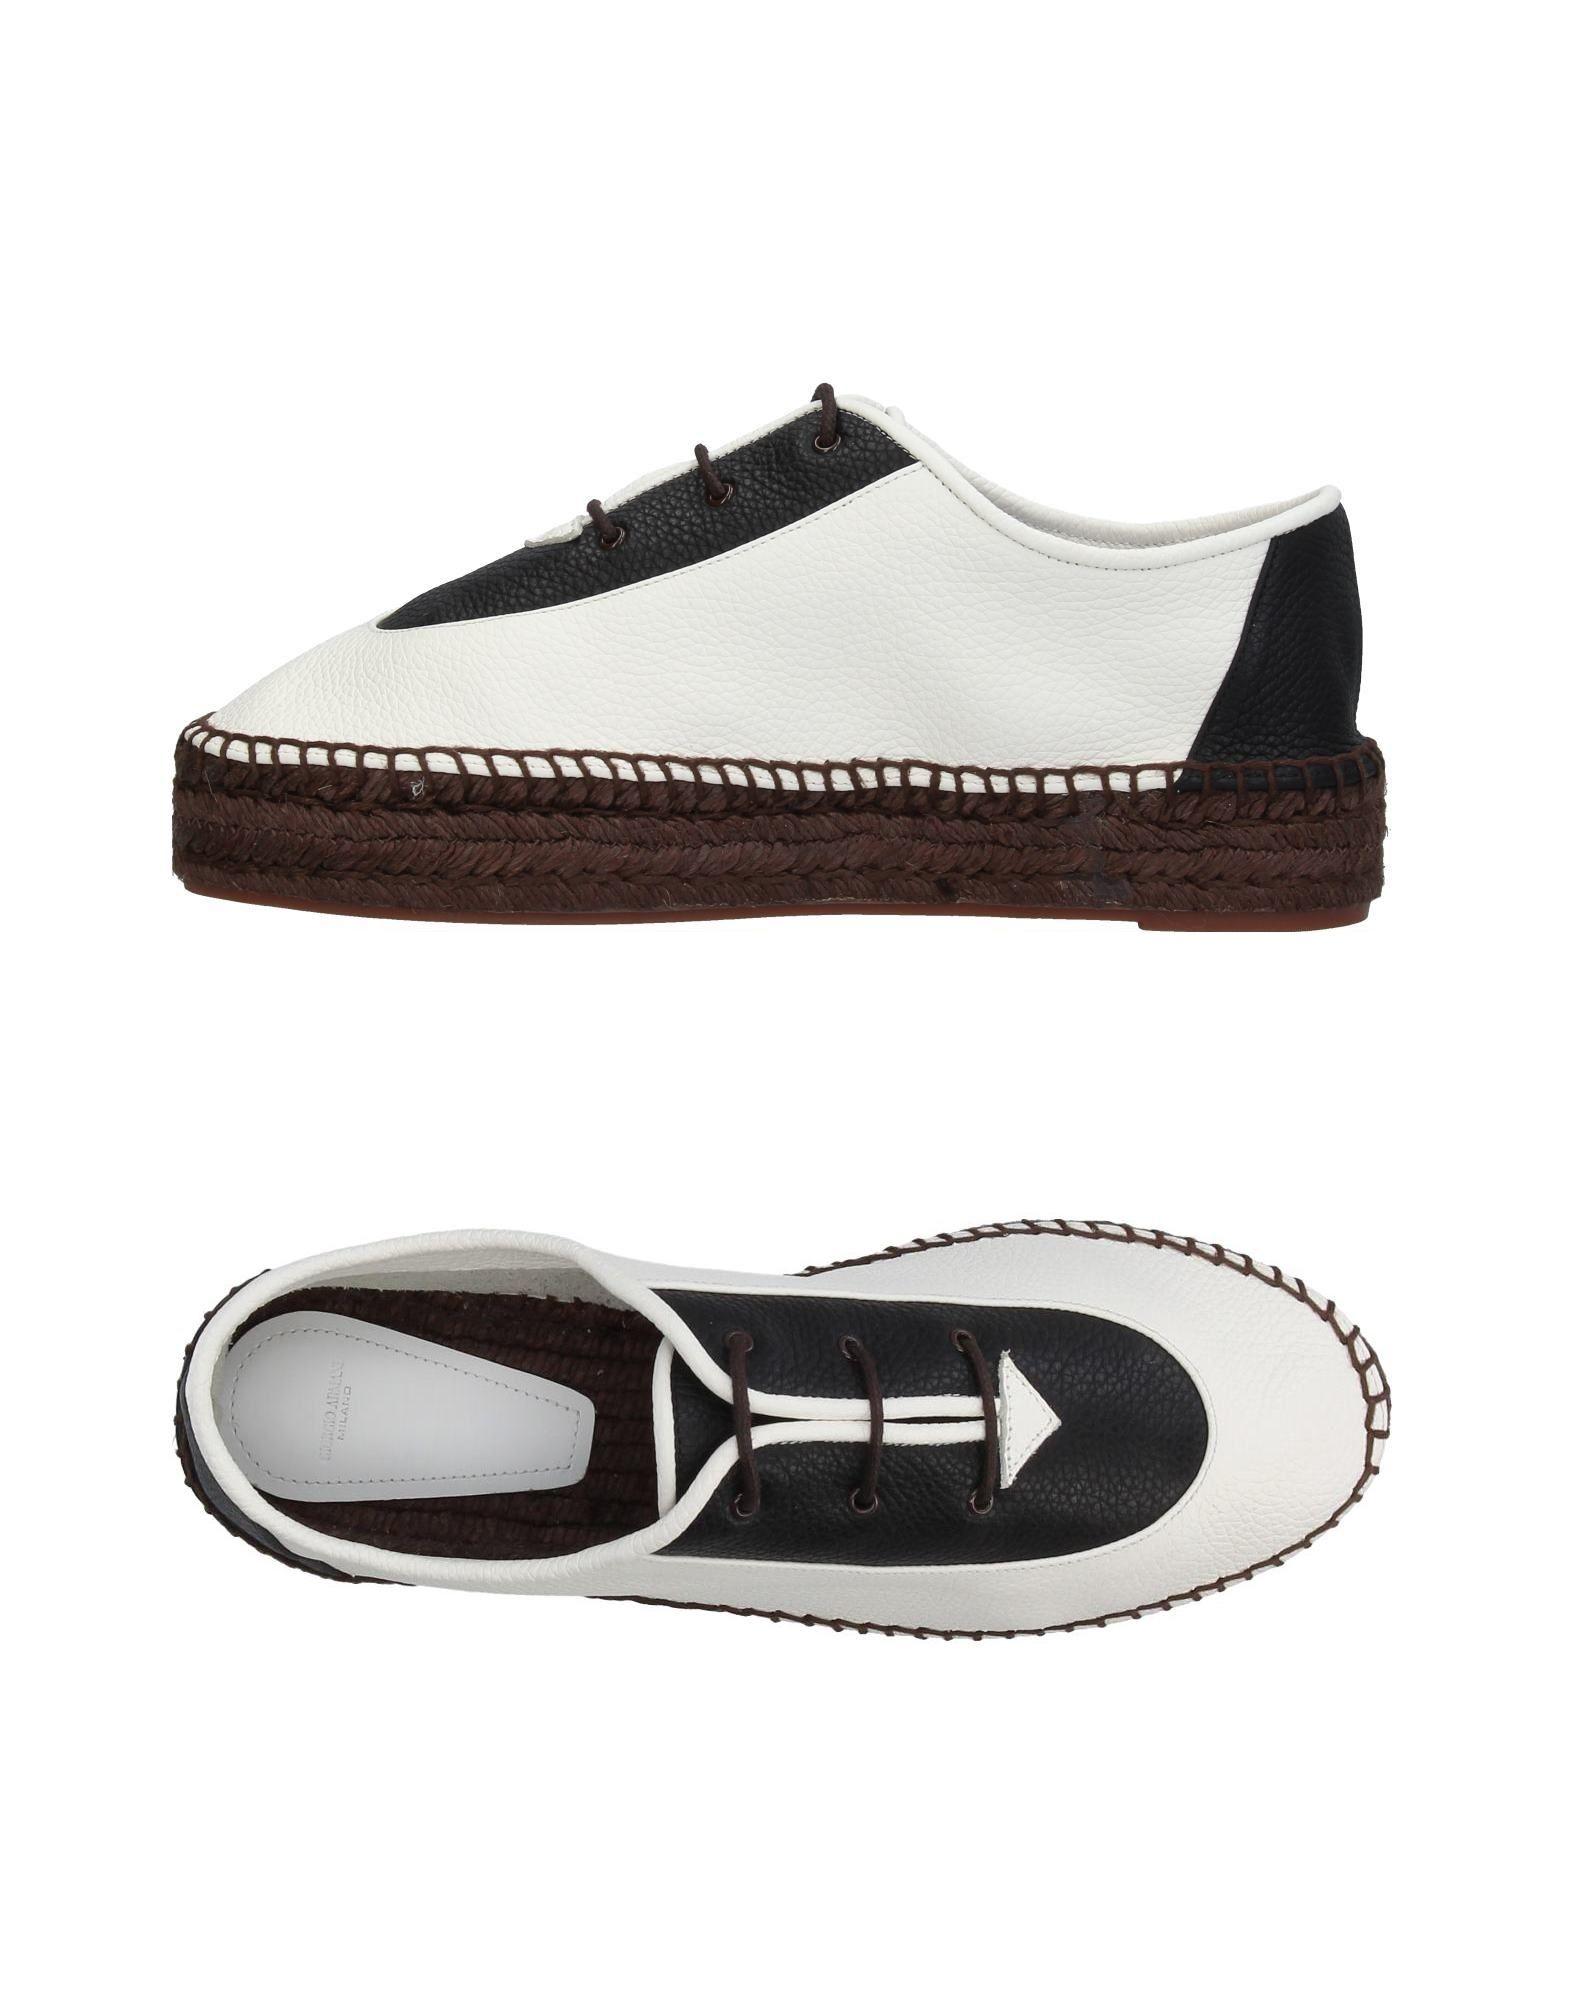 Chaussures À Lacets Giorgio Armani Femme - Chaussures À Lacets Giorgio Armani sur